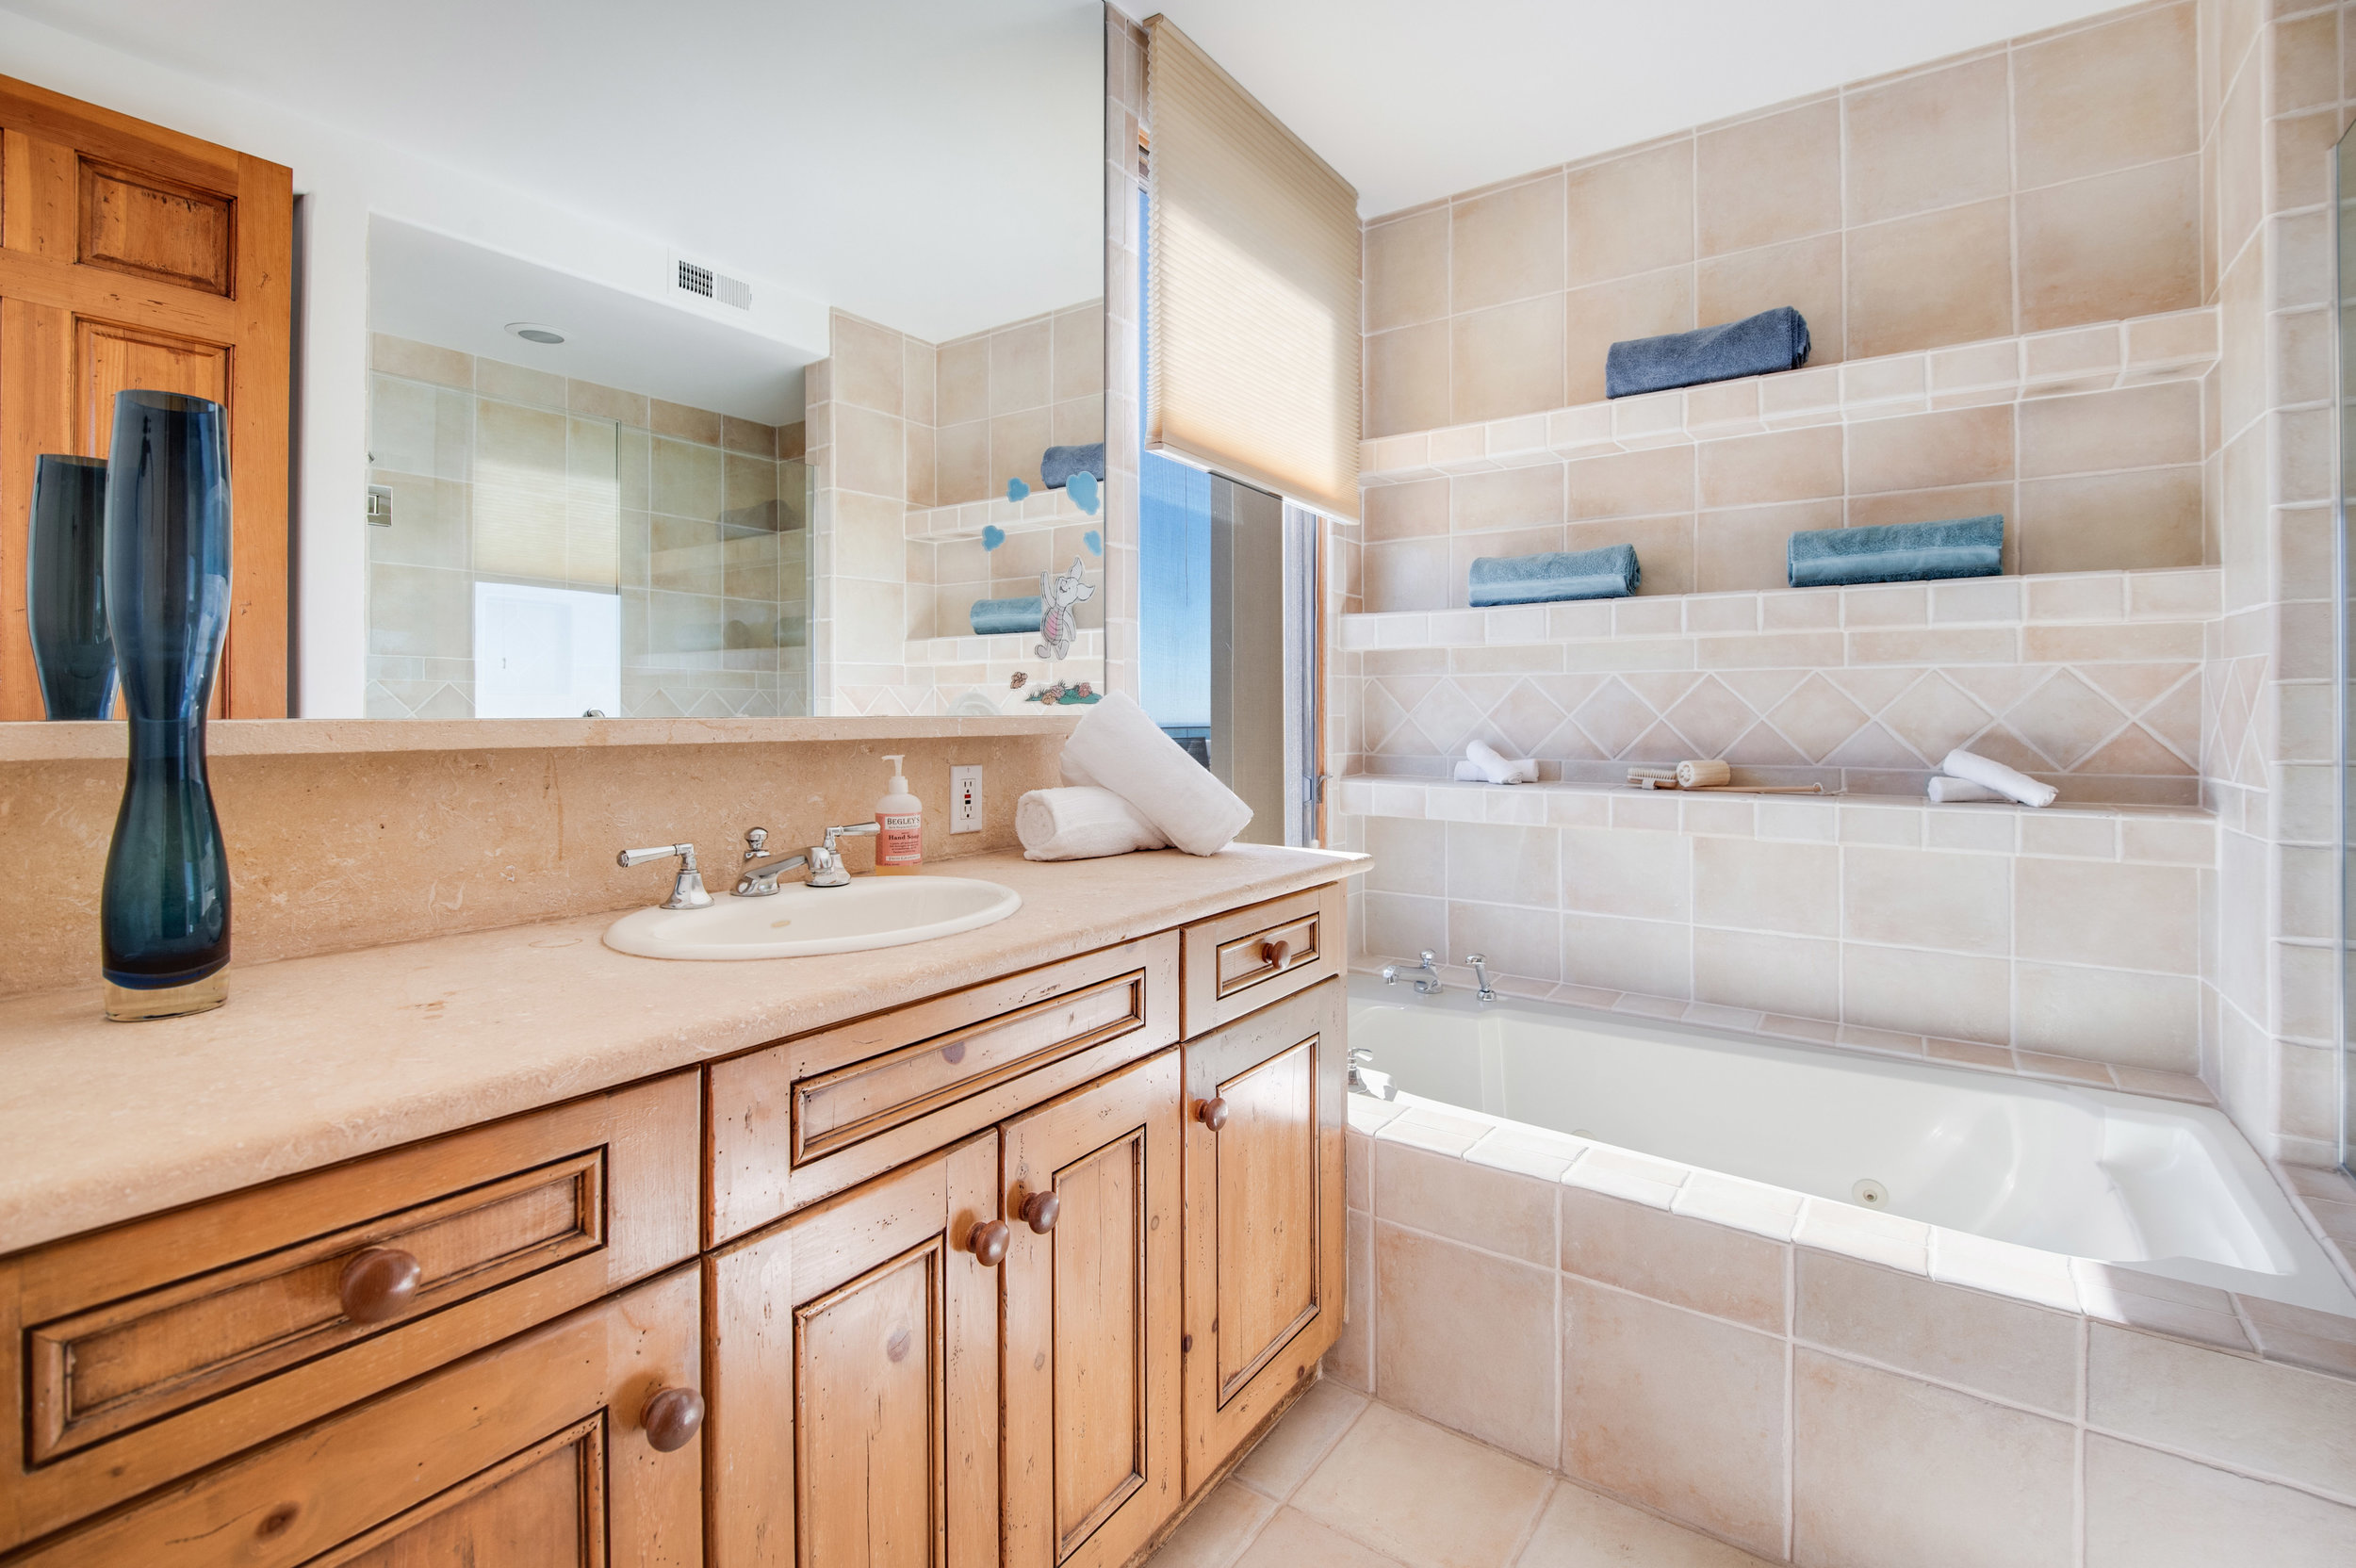 014 Bathroom 27475 Latigo Bay View Drive For Sale Lease The Malibu Life Team Luxury Real Estate.jpg